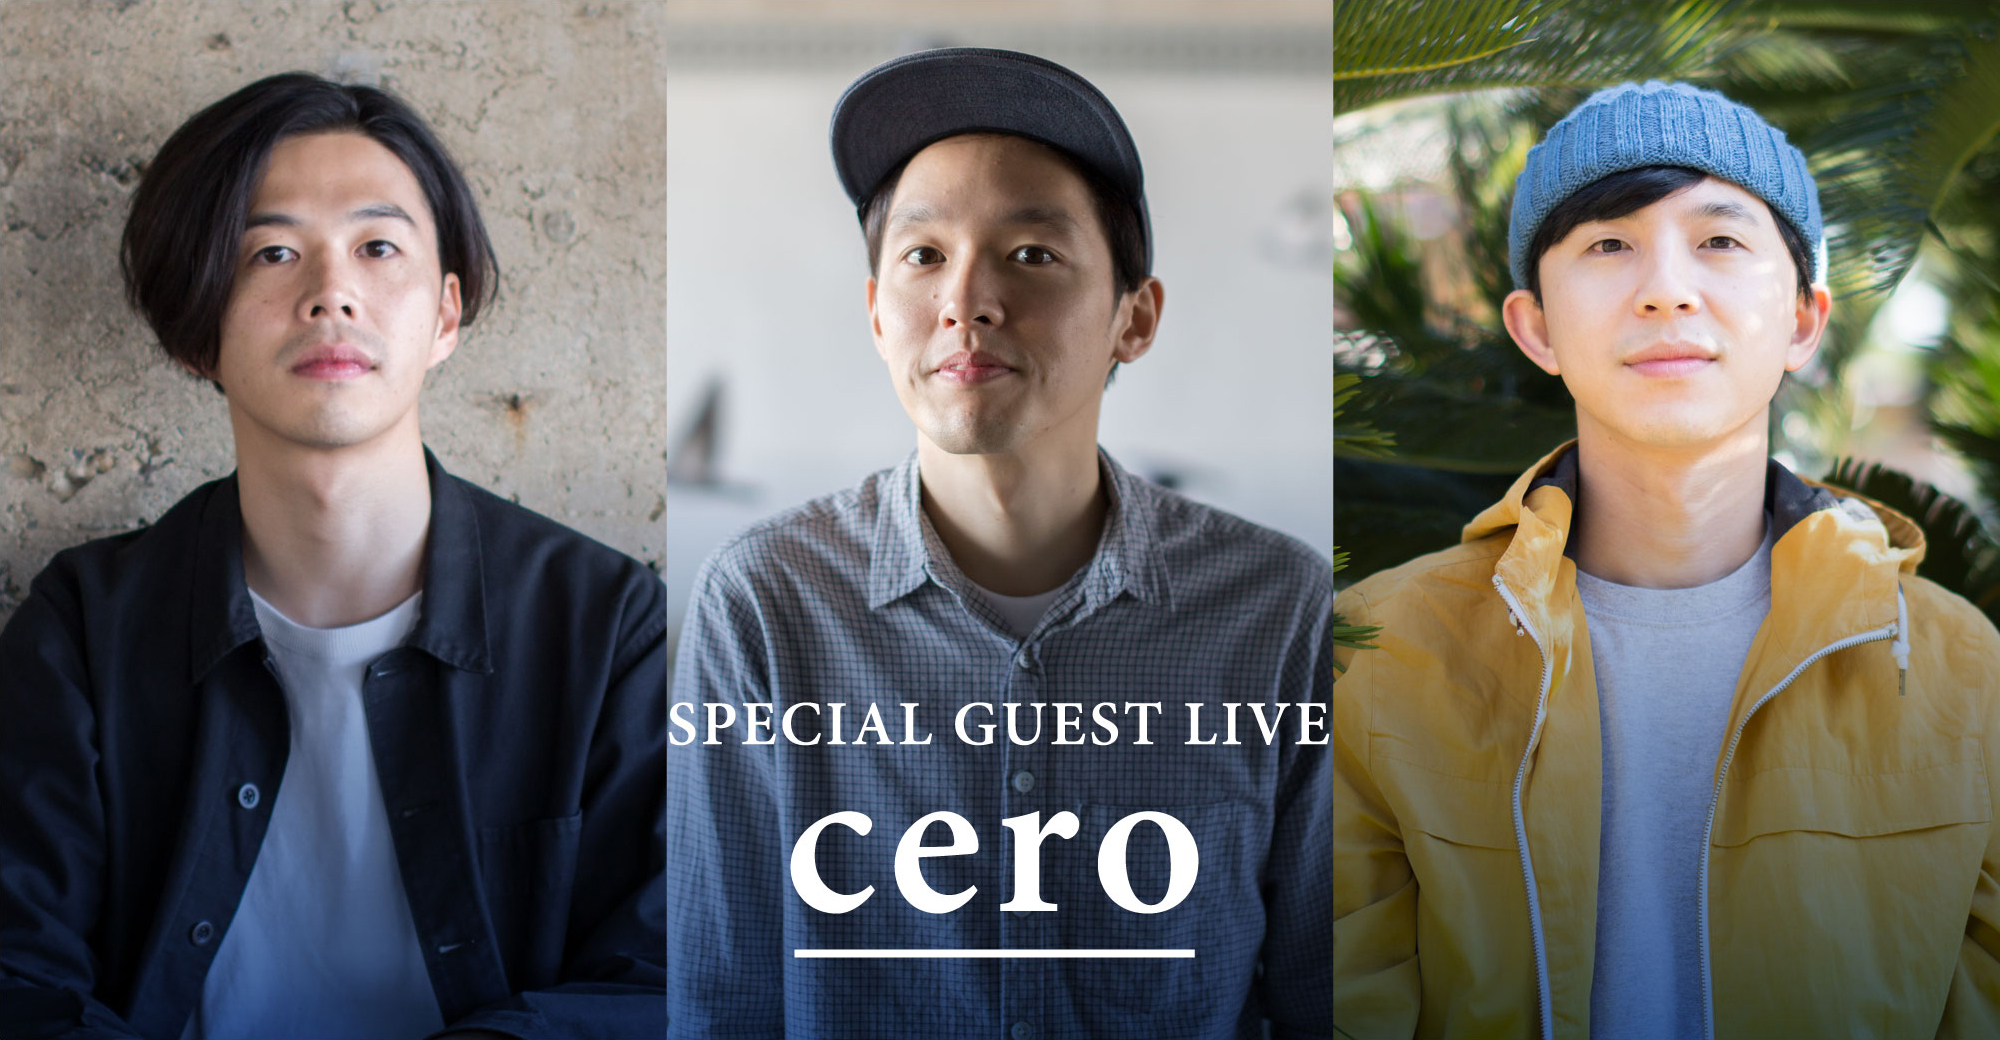 special gest live cero